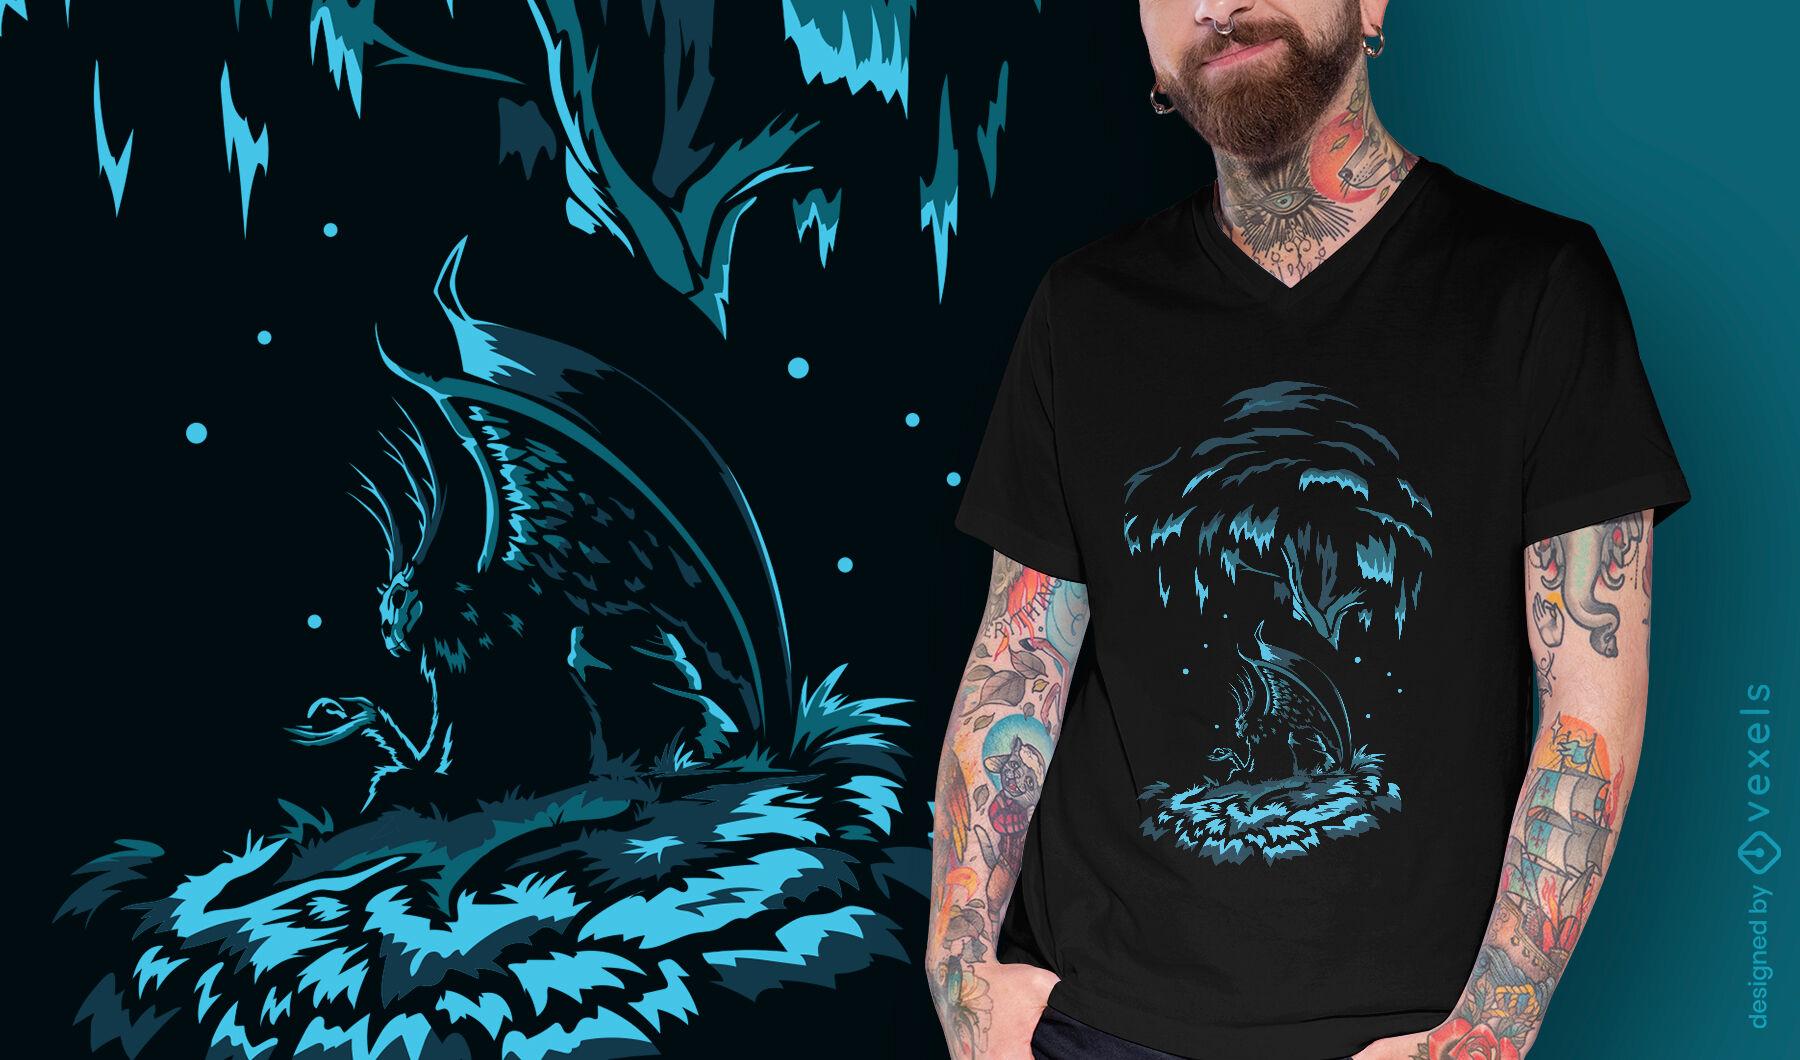 Diseño de camiseta de alas de demonio de criatura oscura.